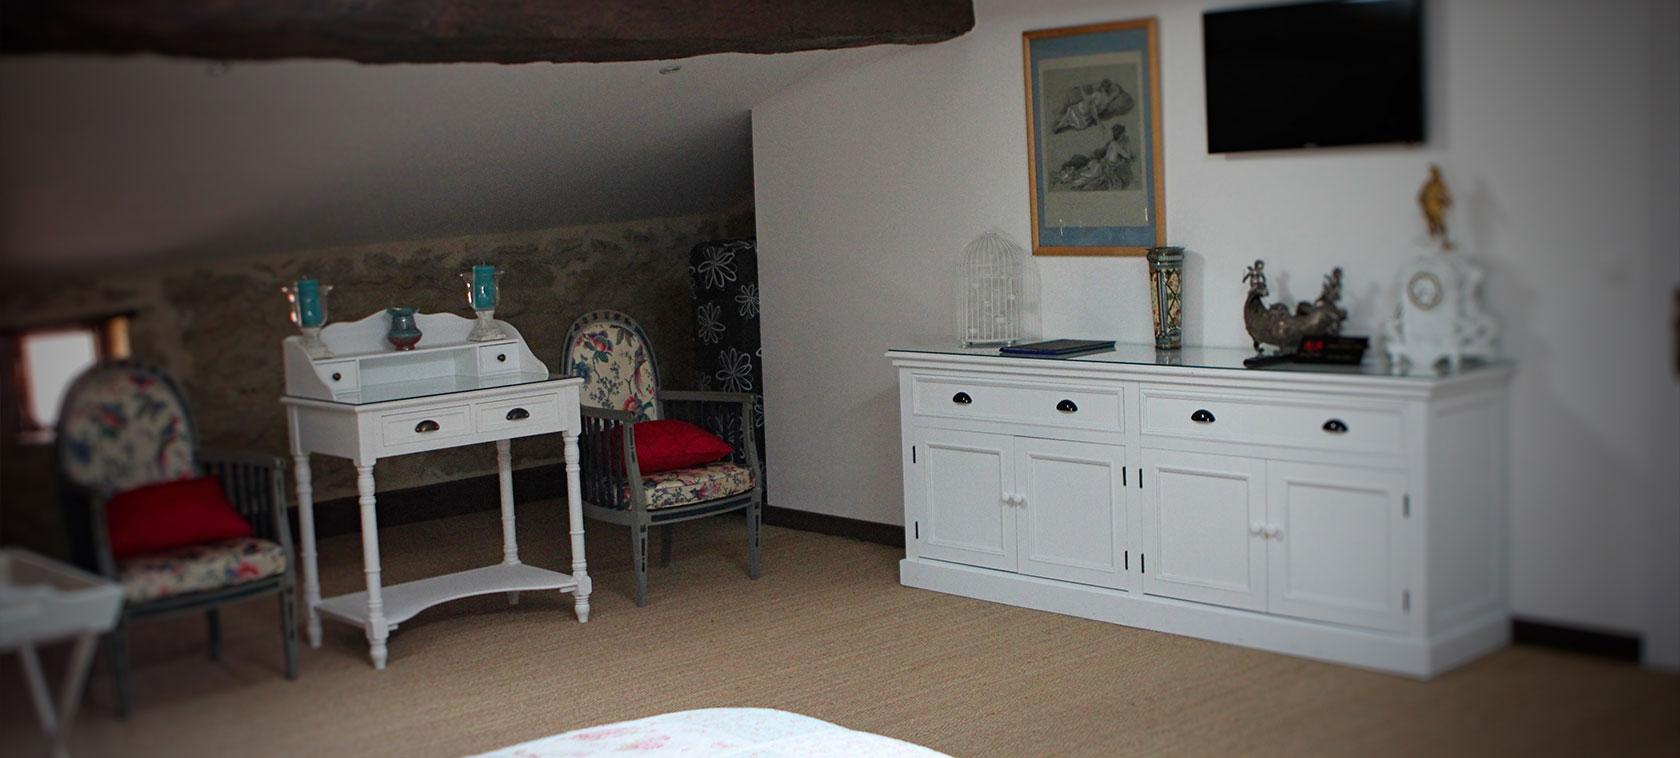 Clairette room